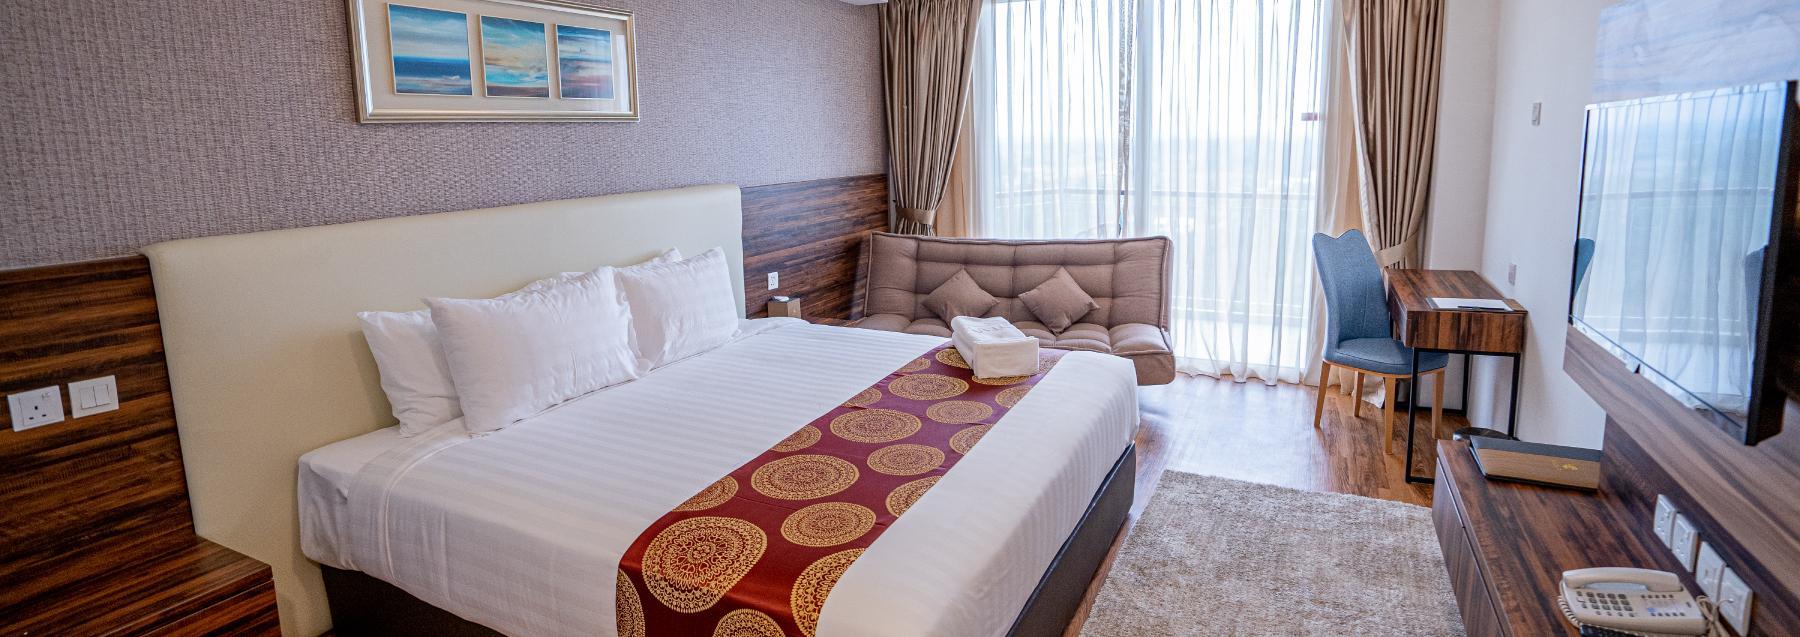 rooms suites desaru johor malaysia 1